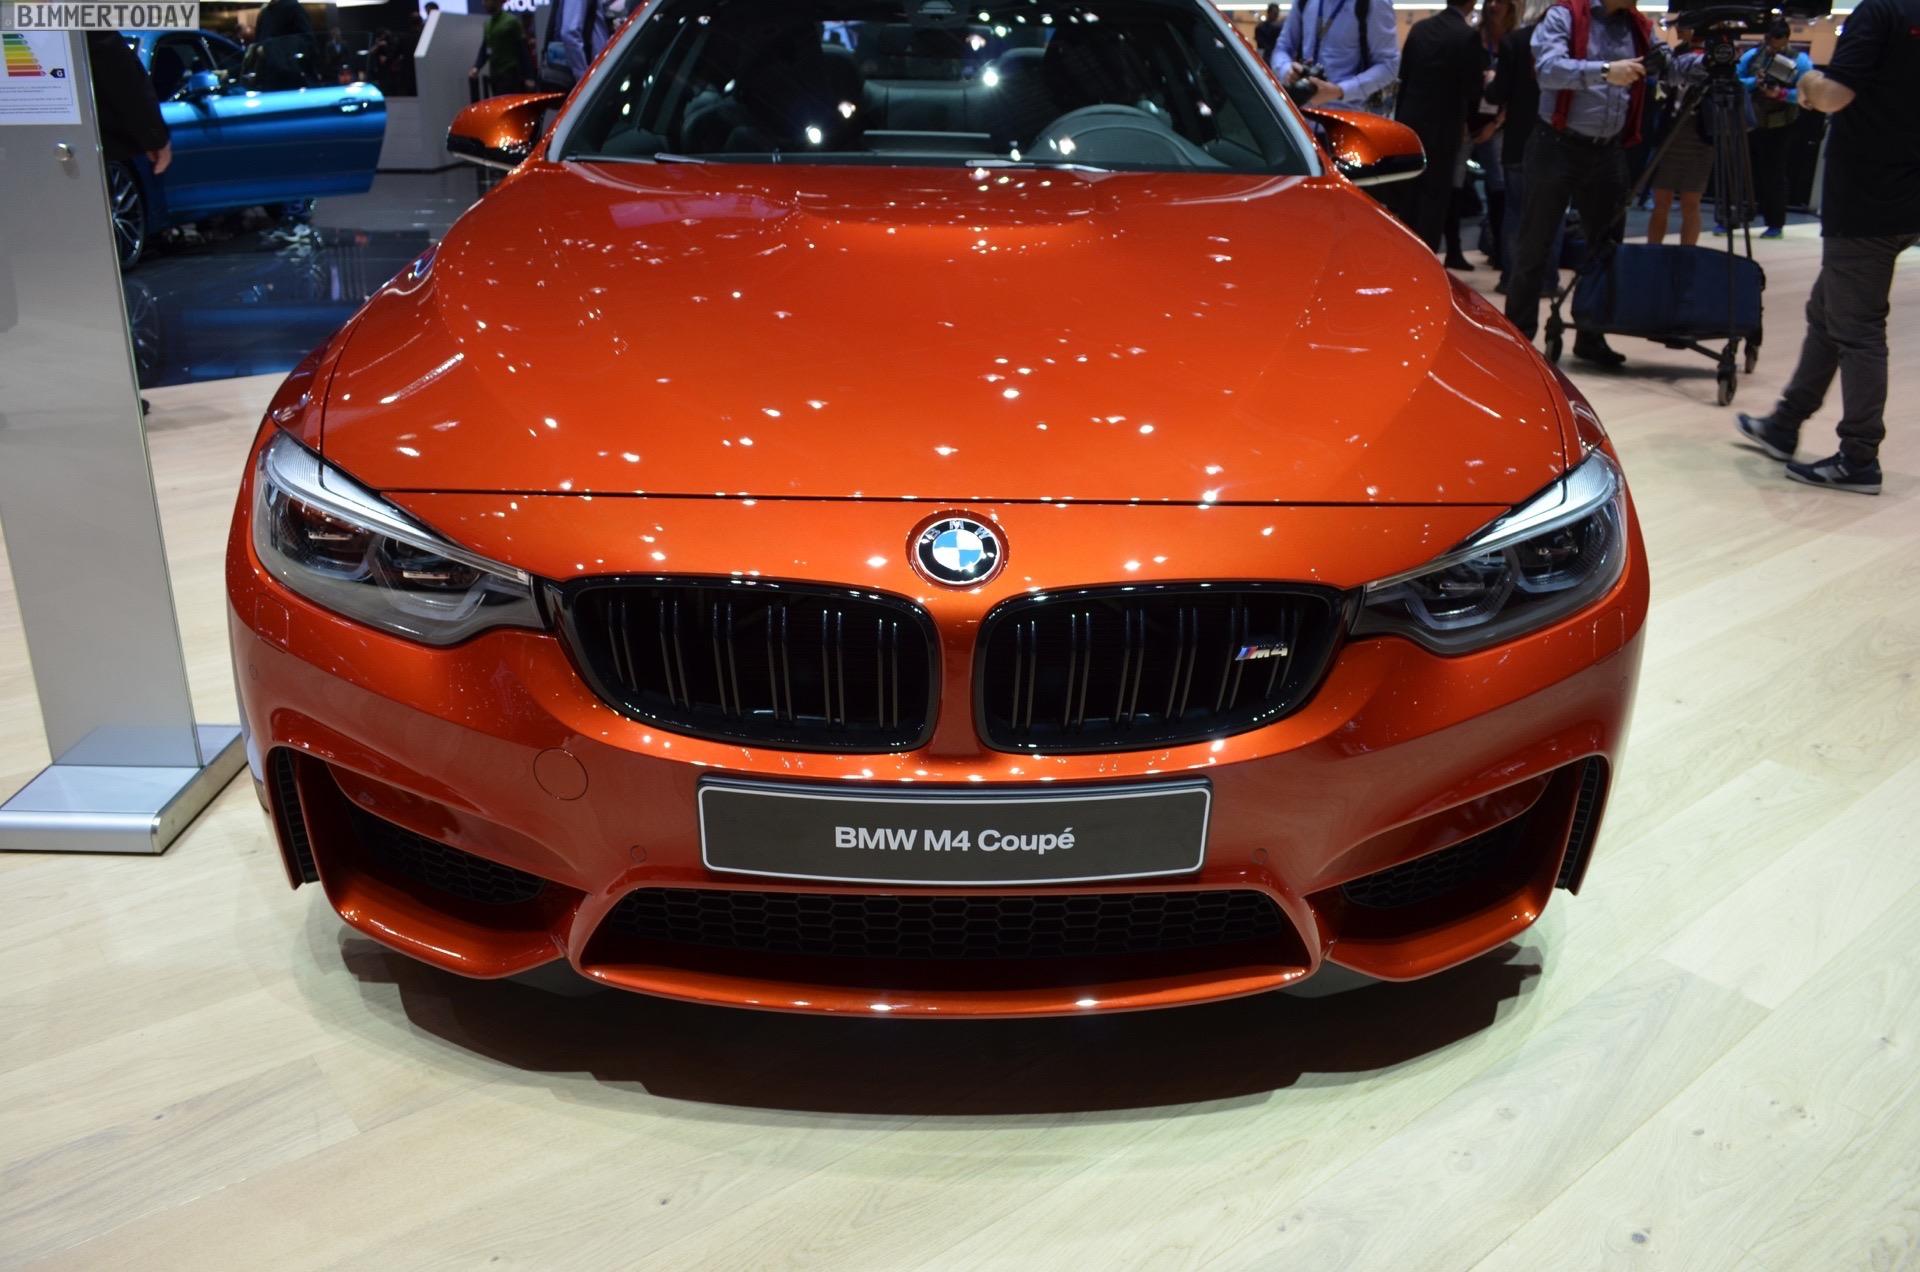 2017 BMW M4 F82 LCI Facelift Competition Coupe Sakhir Orange Genf Live 04